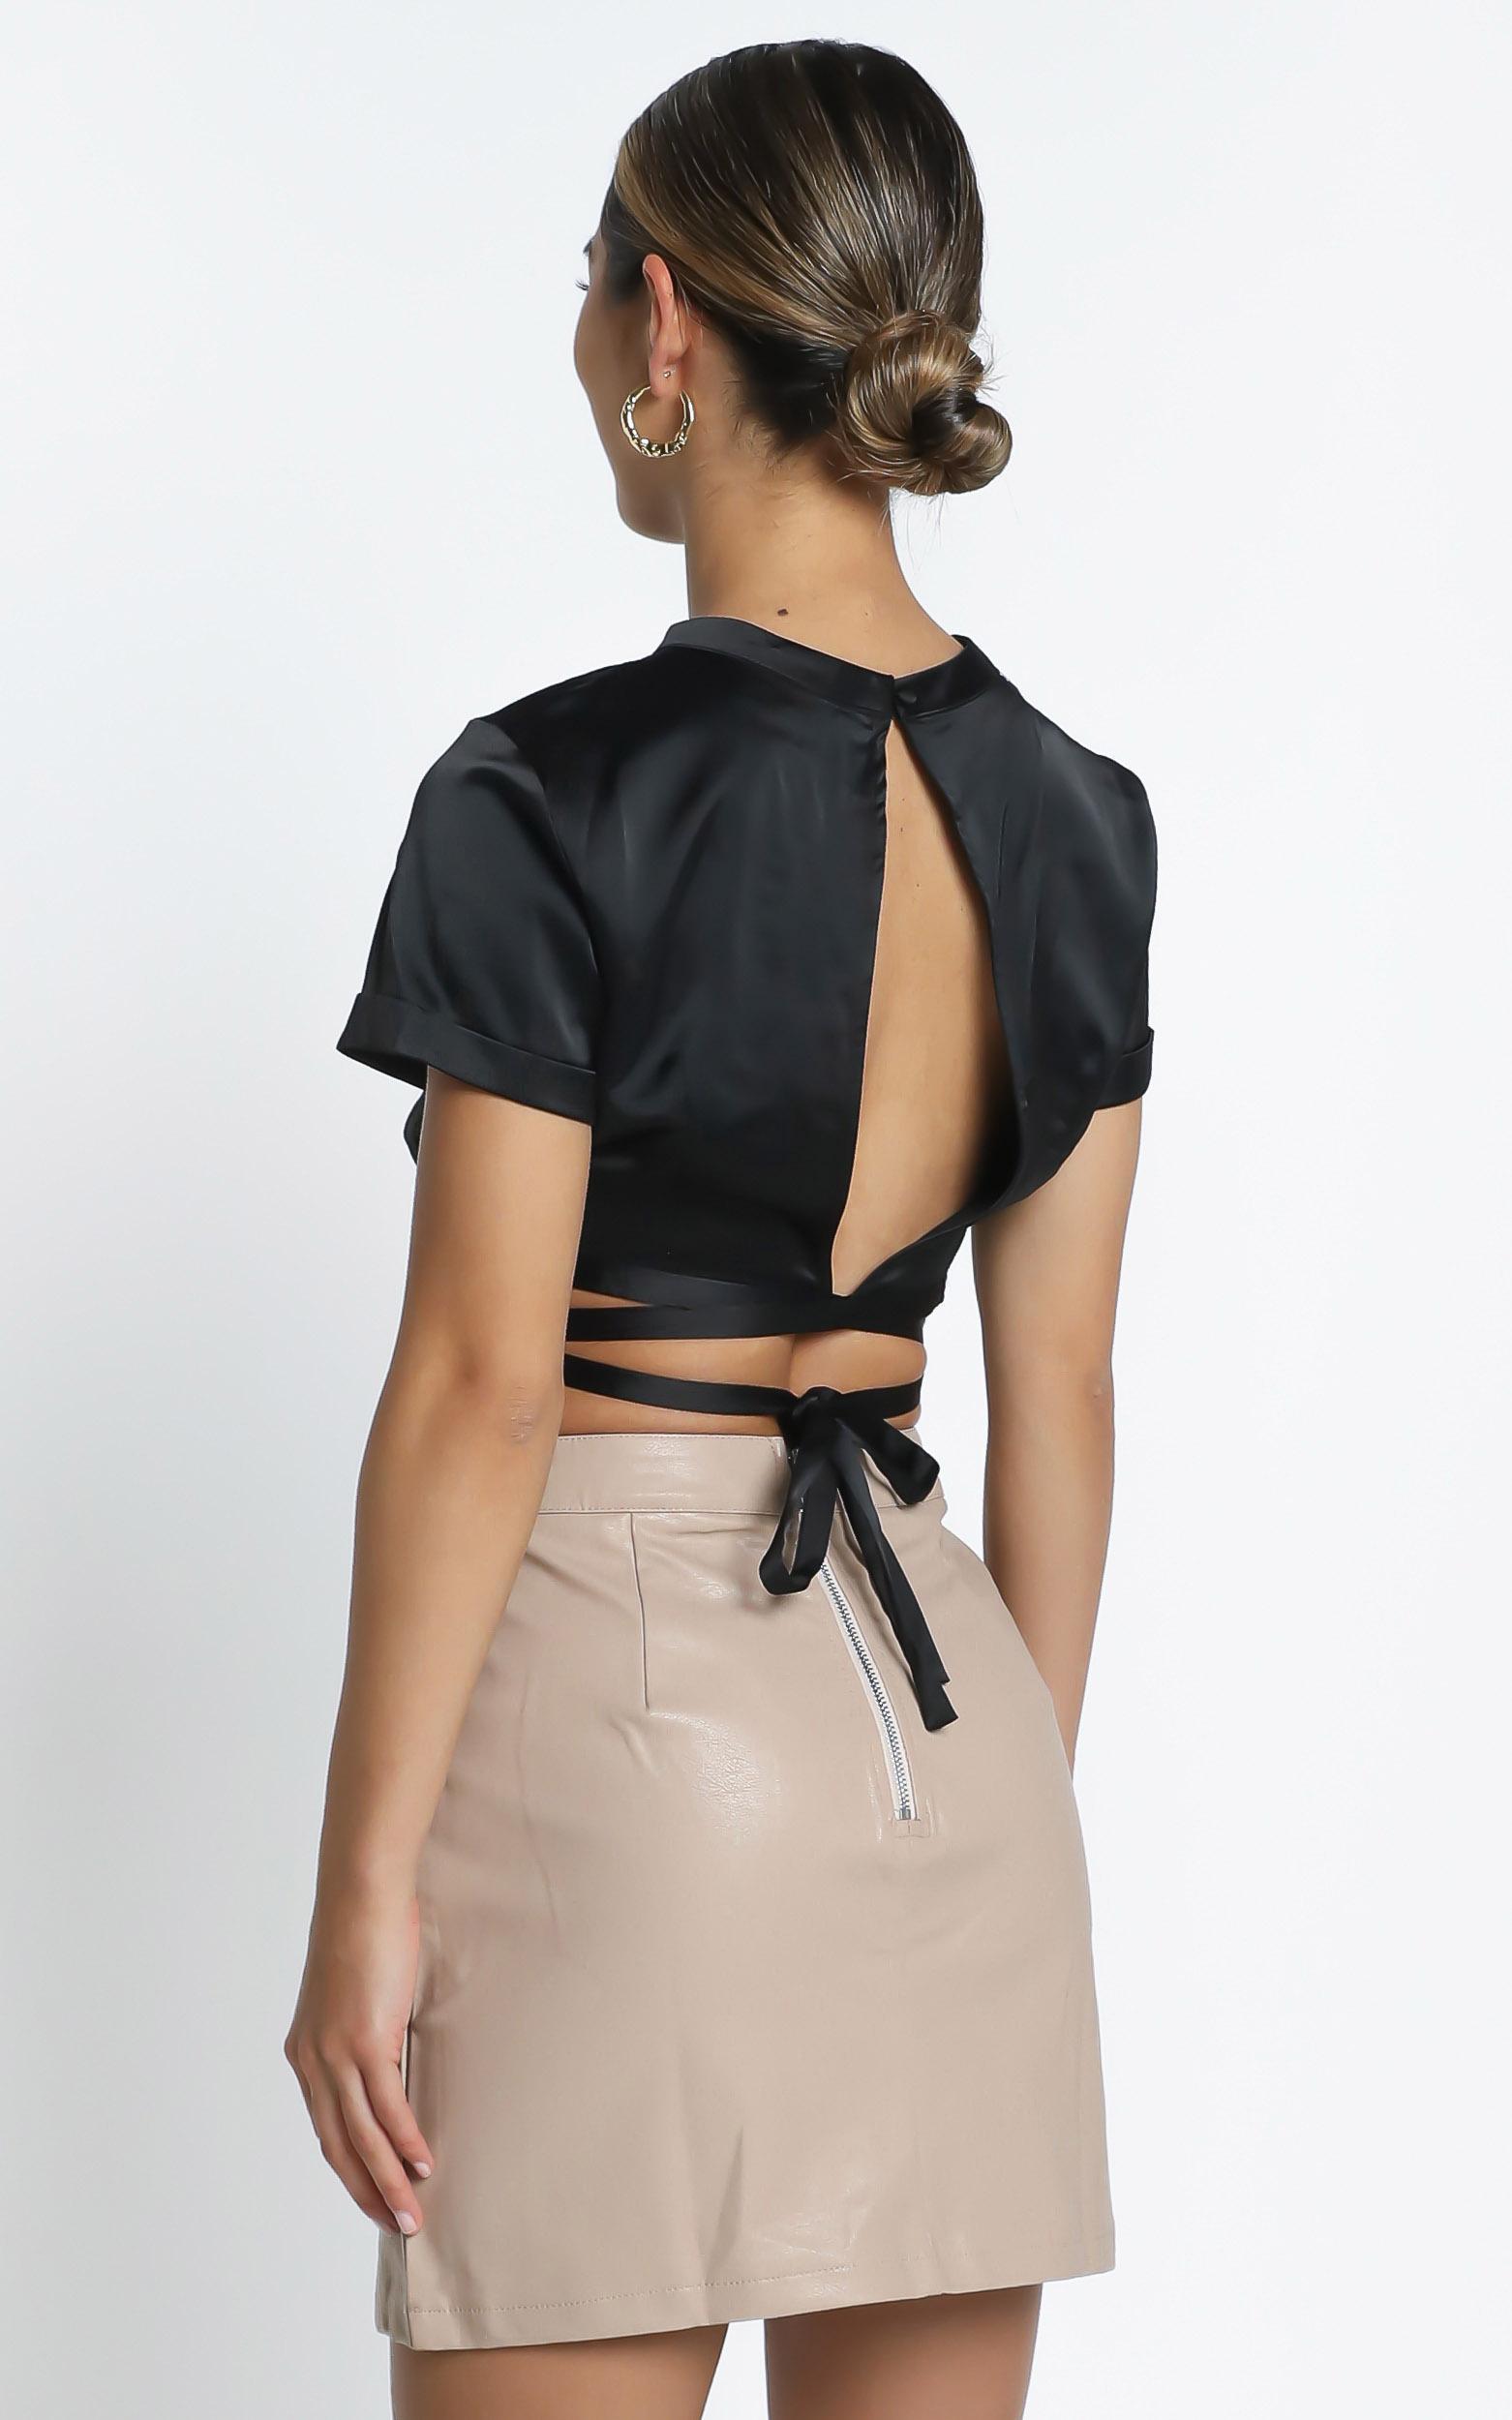 August Skirt in Beige - 12 (L), Beige, hi-res image number null